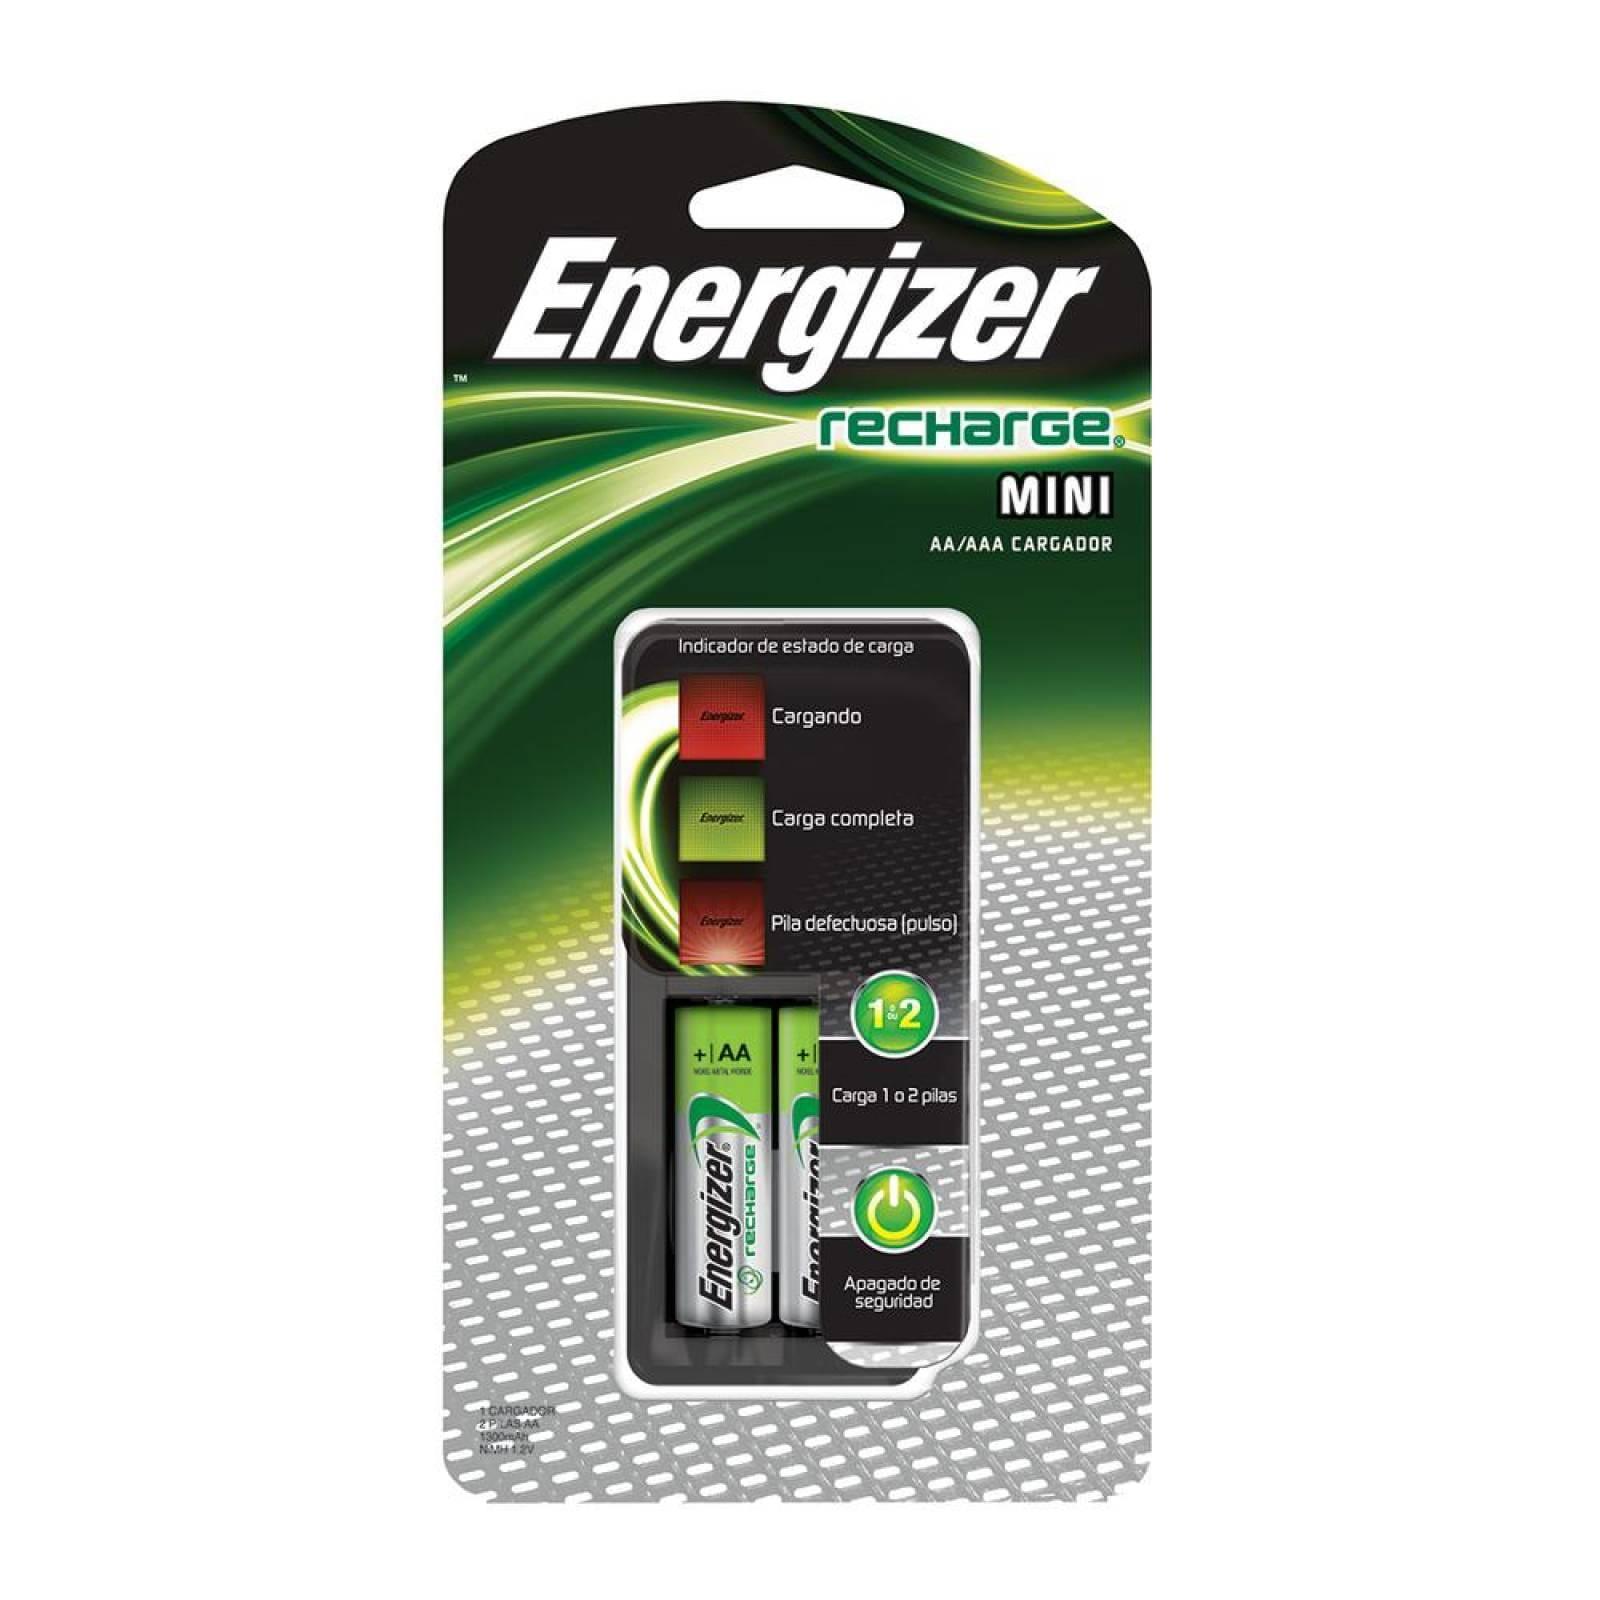 CARGADOR ENERGIZER MINI AAAAA C2 PILAS AA 2300MAH CH2PC4